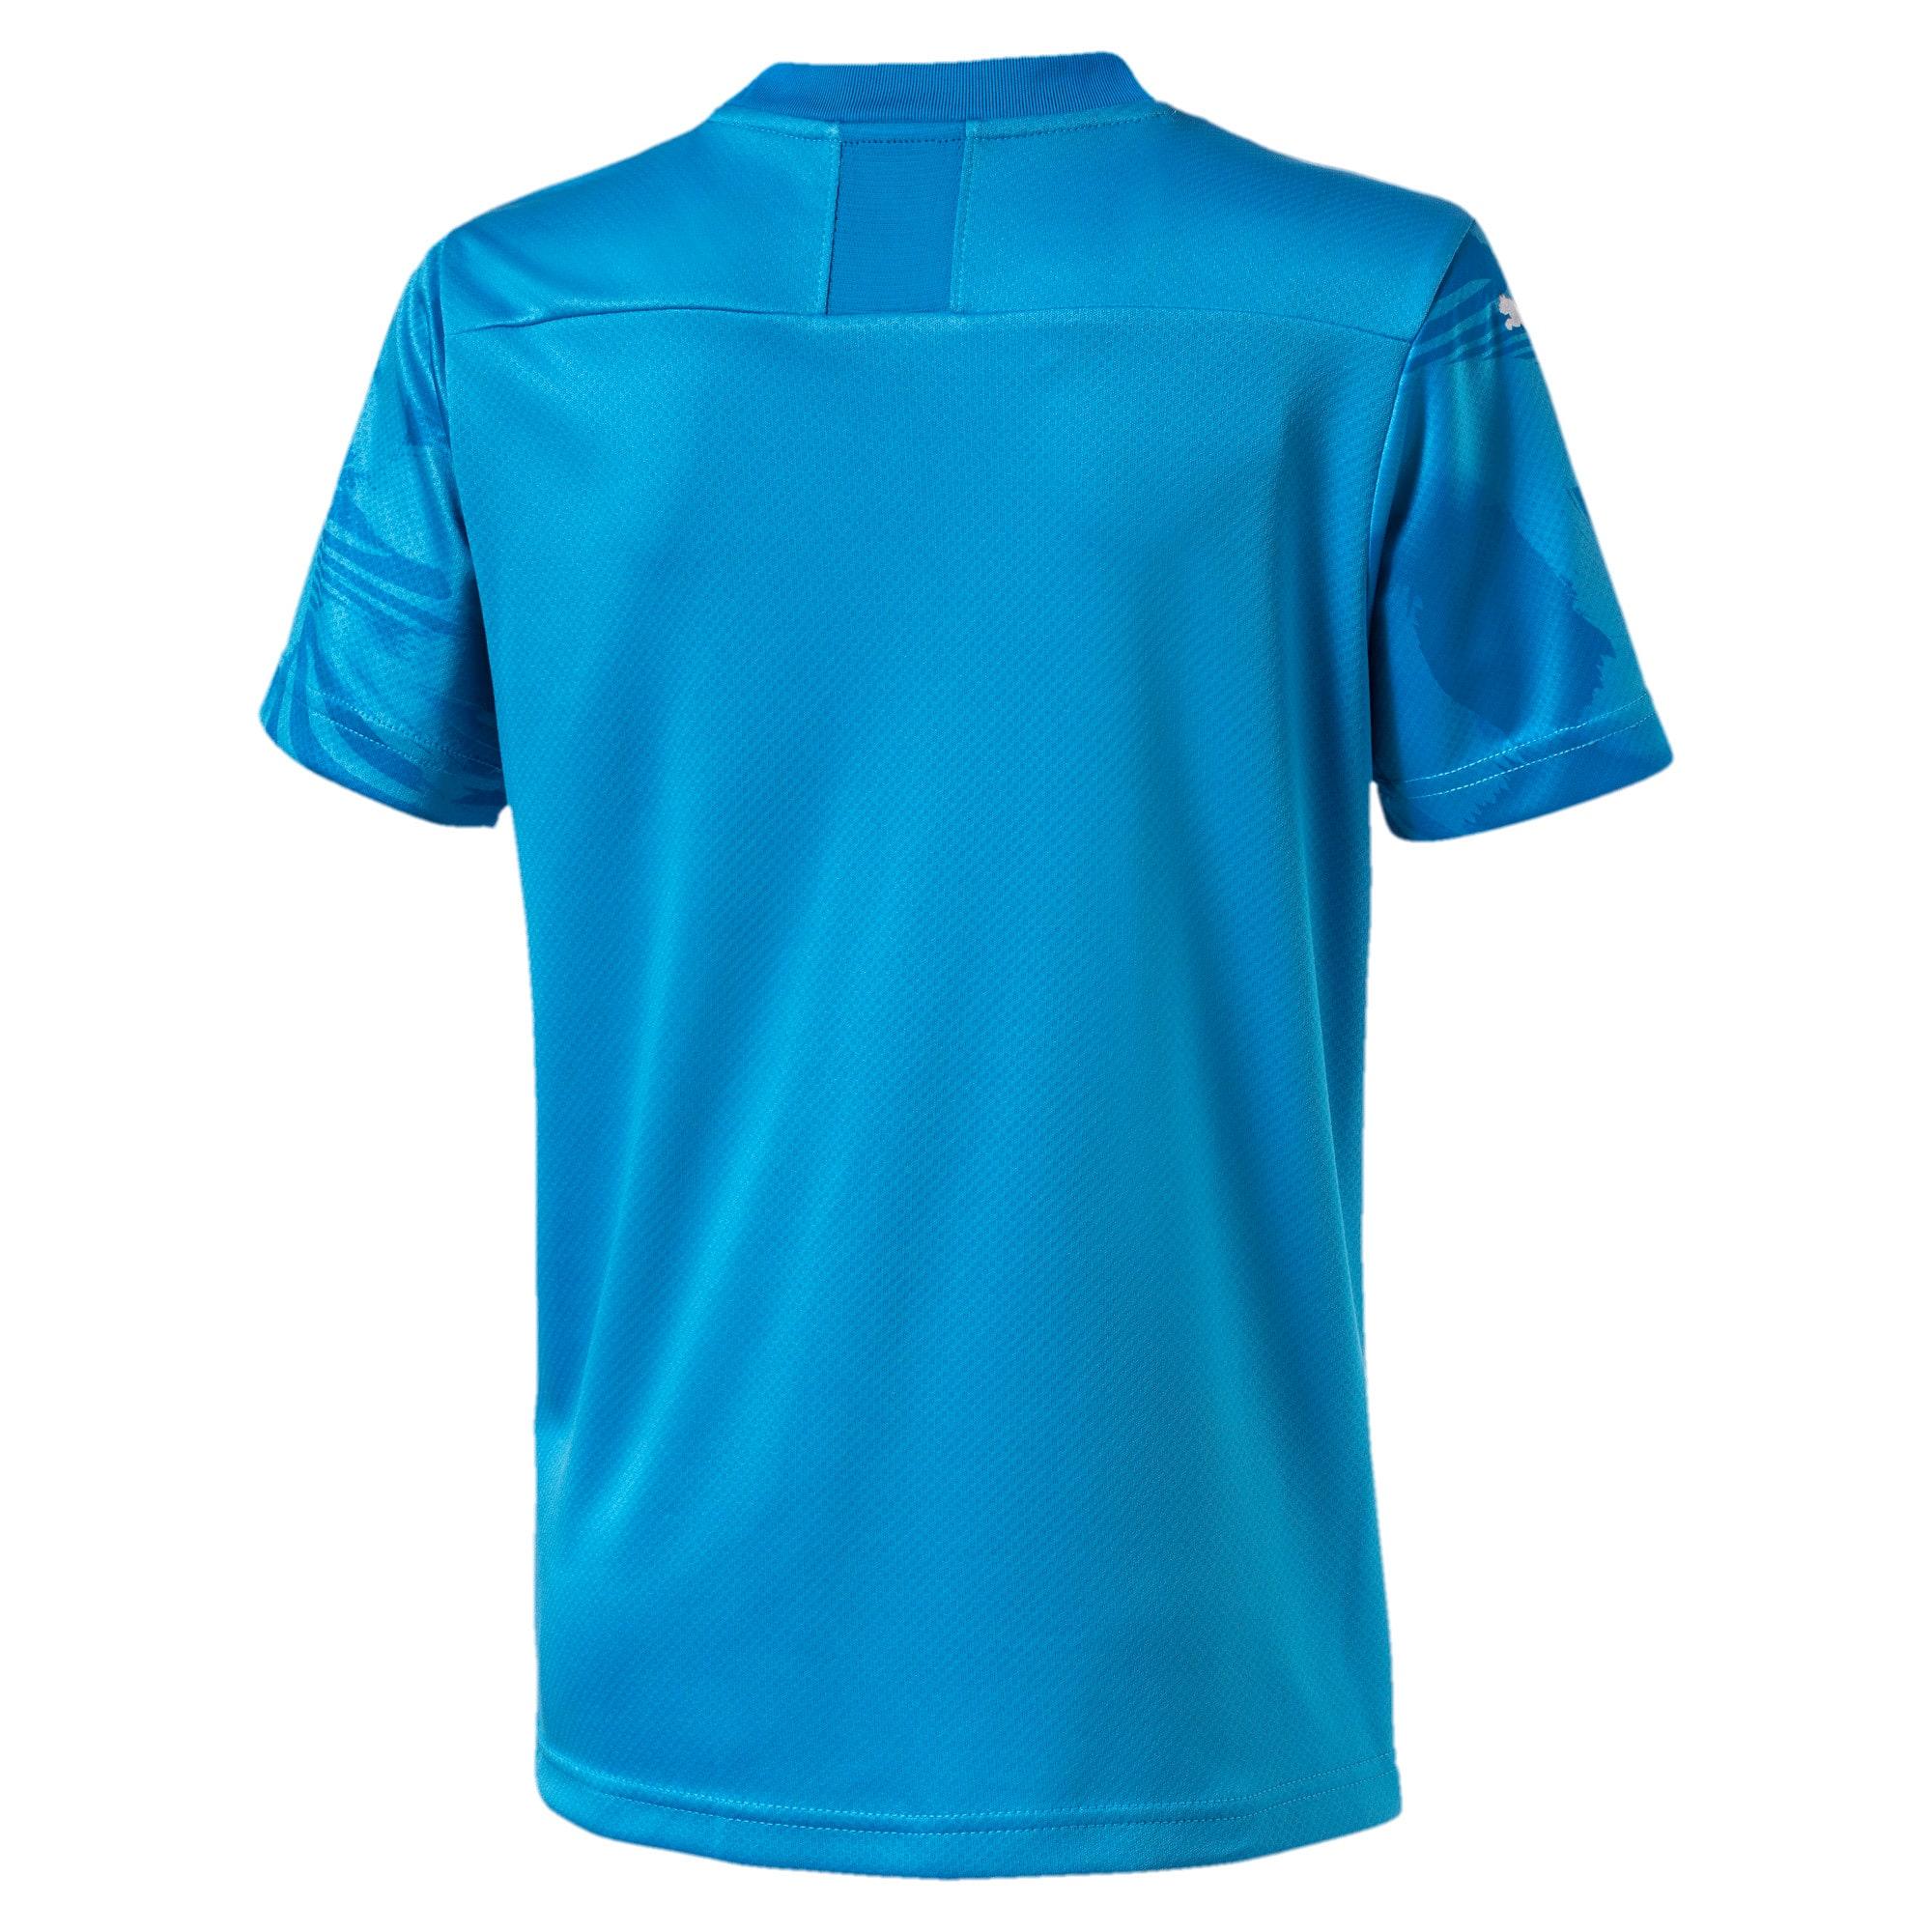 Thumbnail 2 of Valencia CF Third Replica Kids' Shirt, Bleu Azur-Indigo Bunting, medium